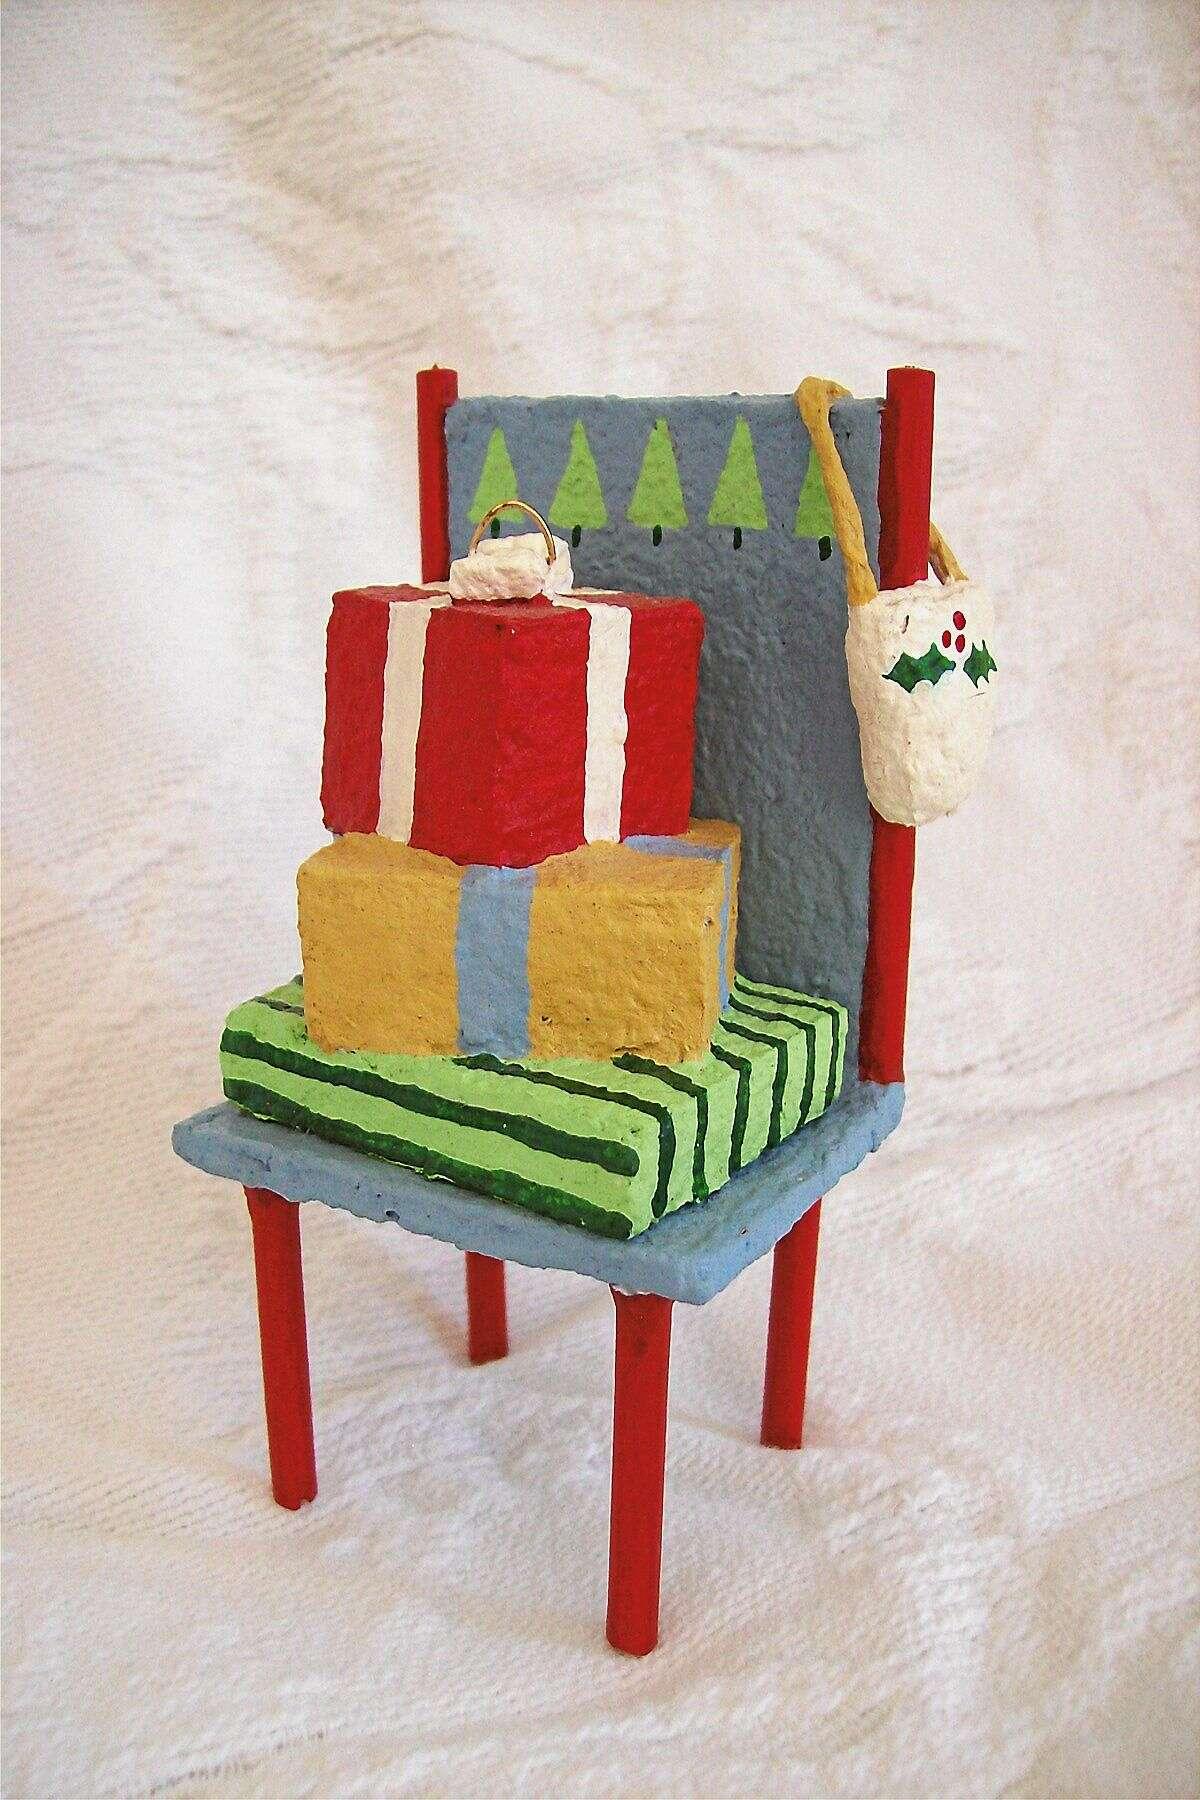 """Holiday Chair Ornament"" is a mixed media creation by Margaret von Kleist Emond."